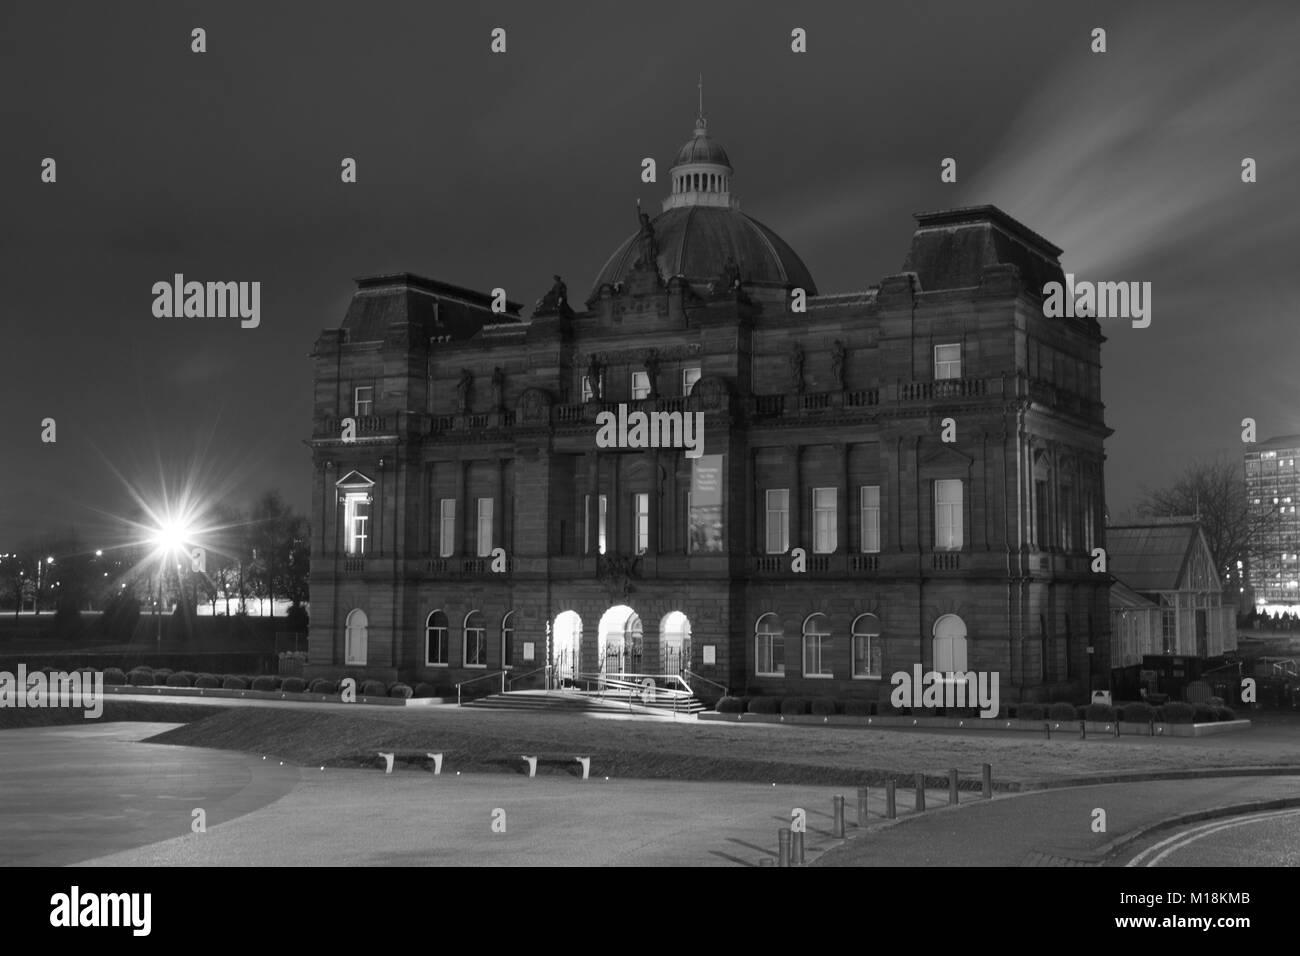 Abandoned Buidings Glasgow. - Stock Image